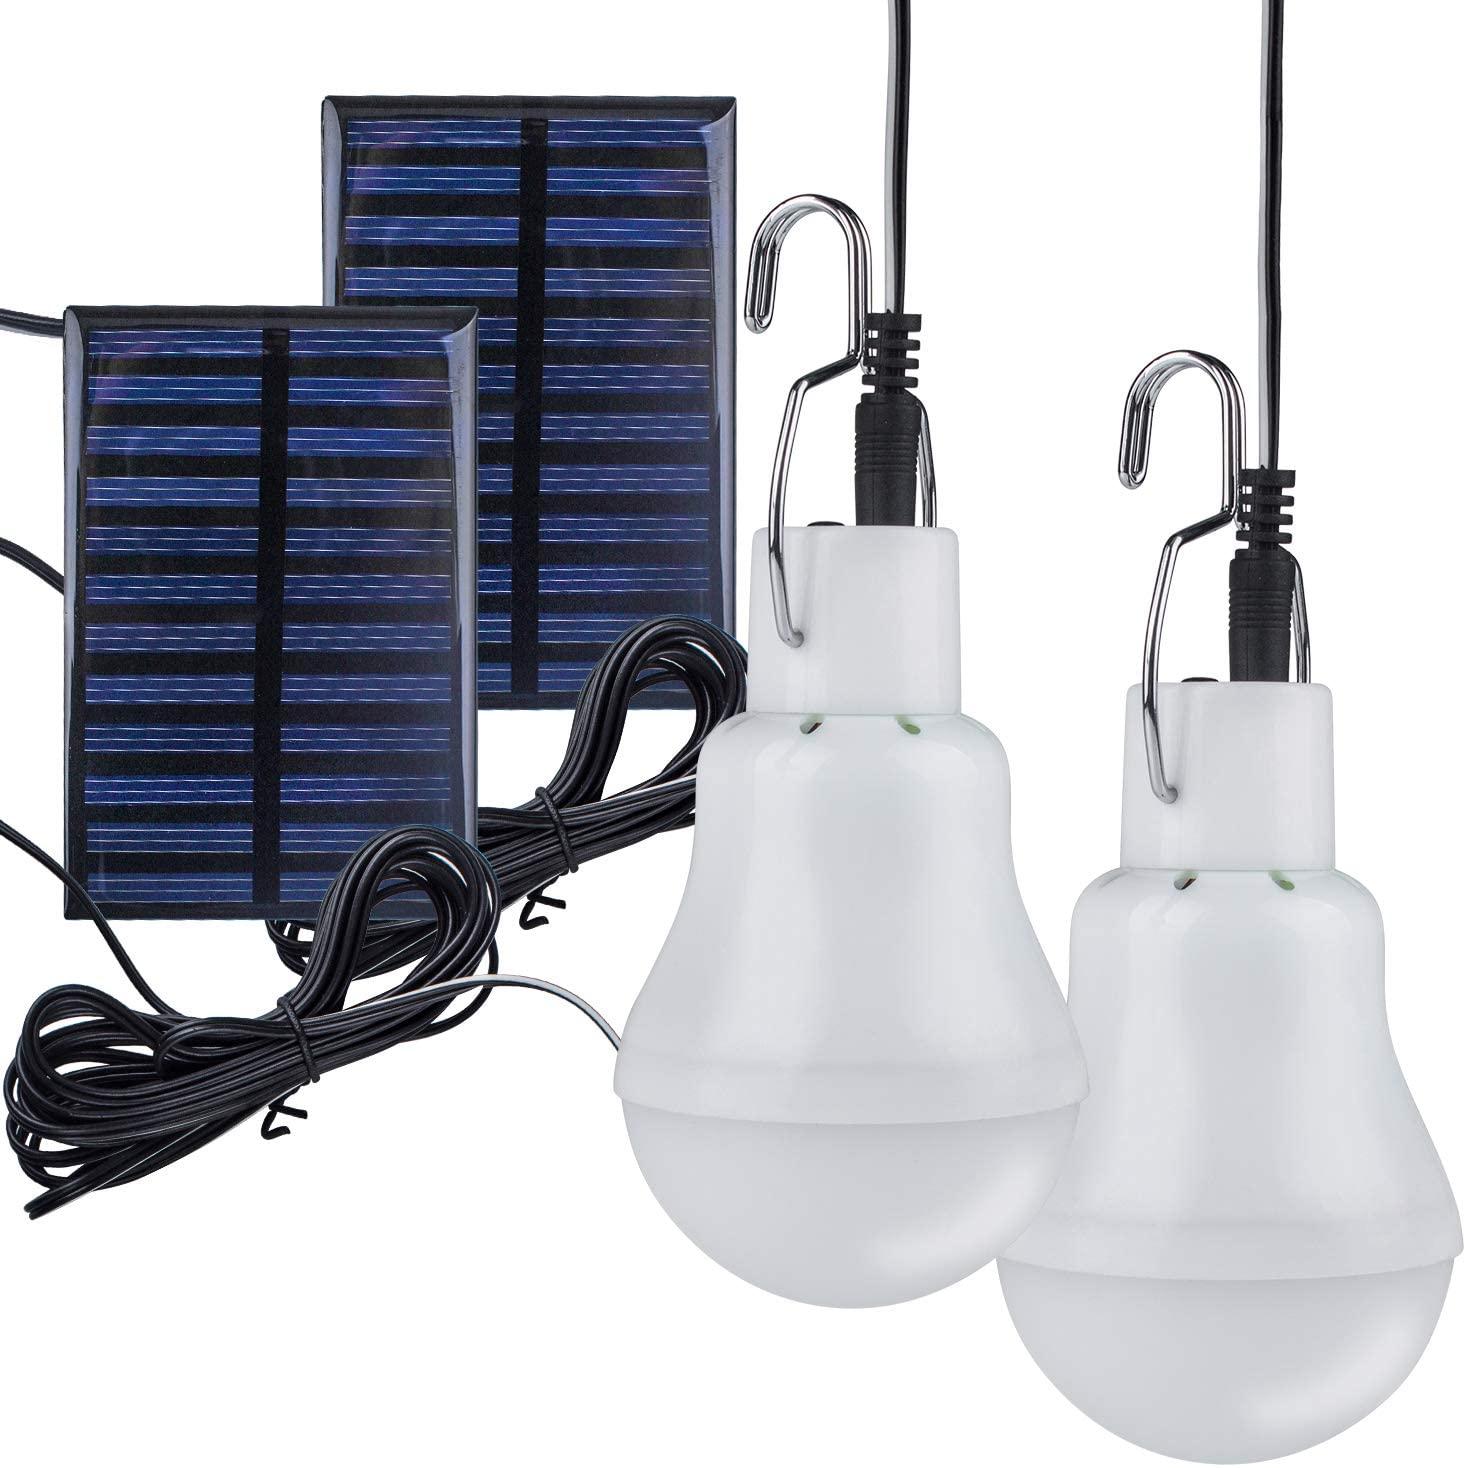 Solar Powered Led Light Bulb, TechKen Portable Lantern Lamp Spotlight Indoor Outdoor Garden Office Kitchen Reading with Solar Panel for Garden Patio Yard Hiking Camping Tent Fishing Lighting(2 Pack)